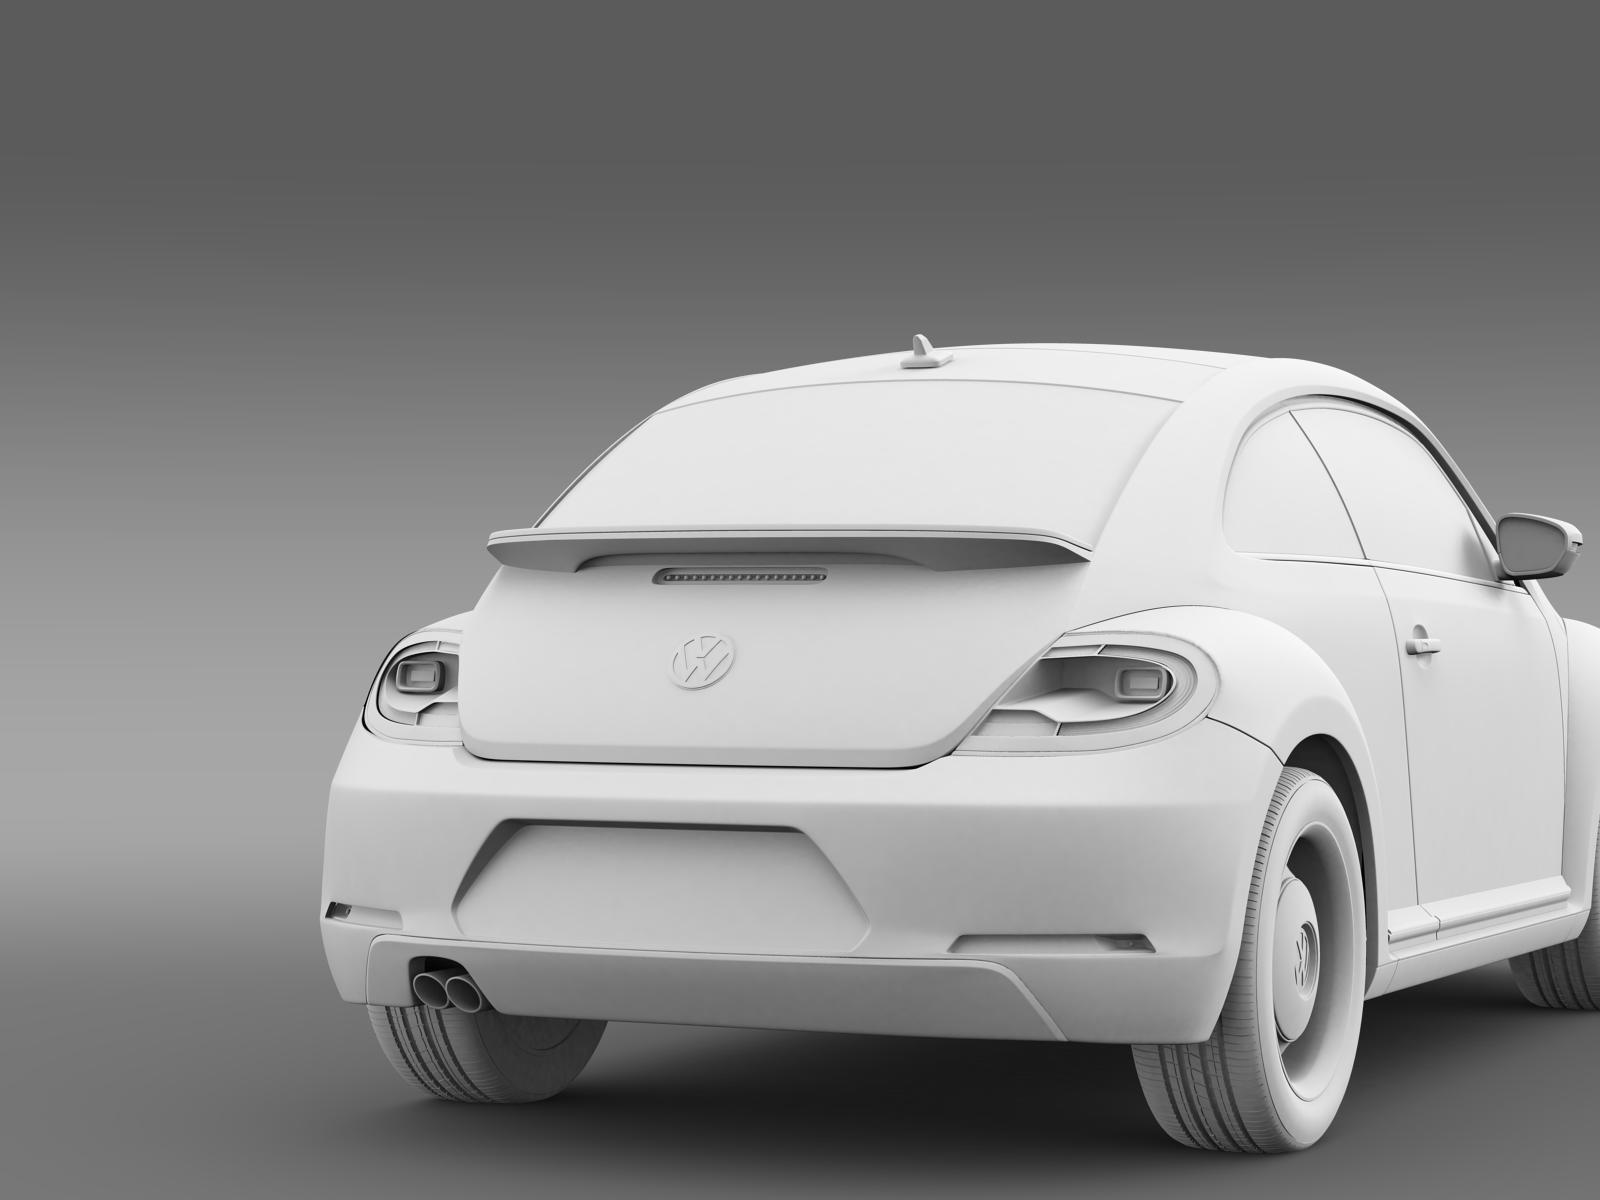 volkswagen beetle classic 2015 3d model buy volkswagen beetle classic 2015 3d model flatpyramid. Black Bedroom Furniture Sets. Home Design Ideas